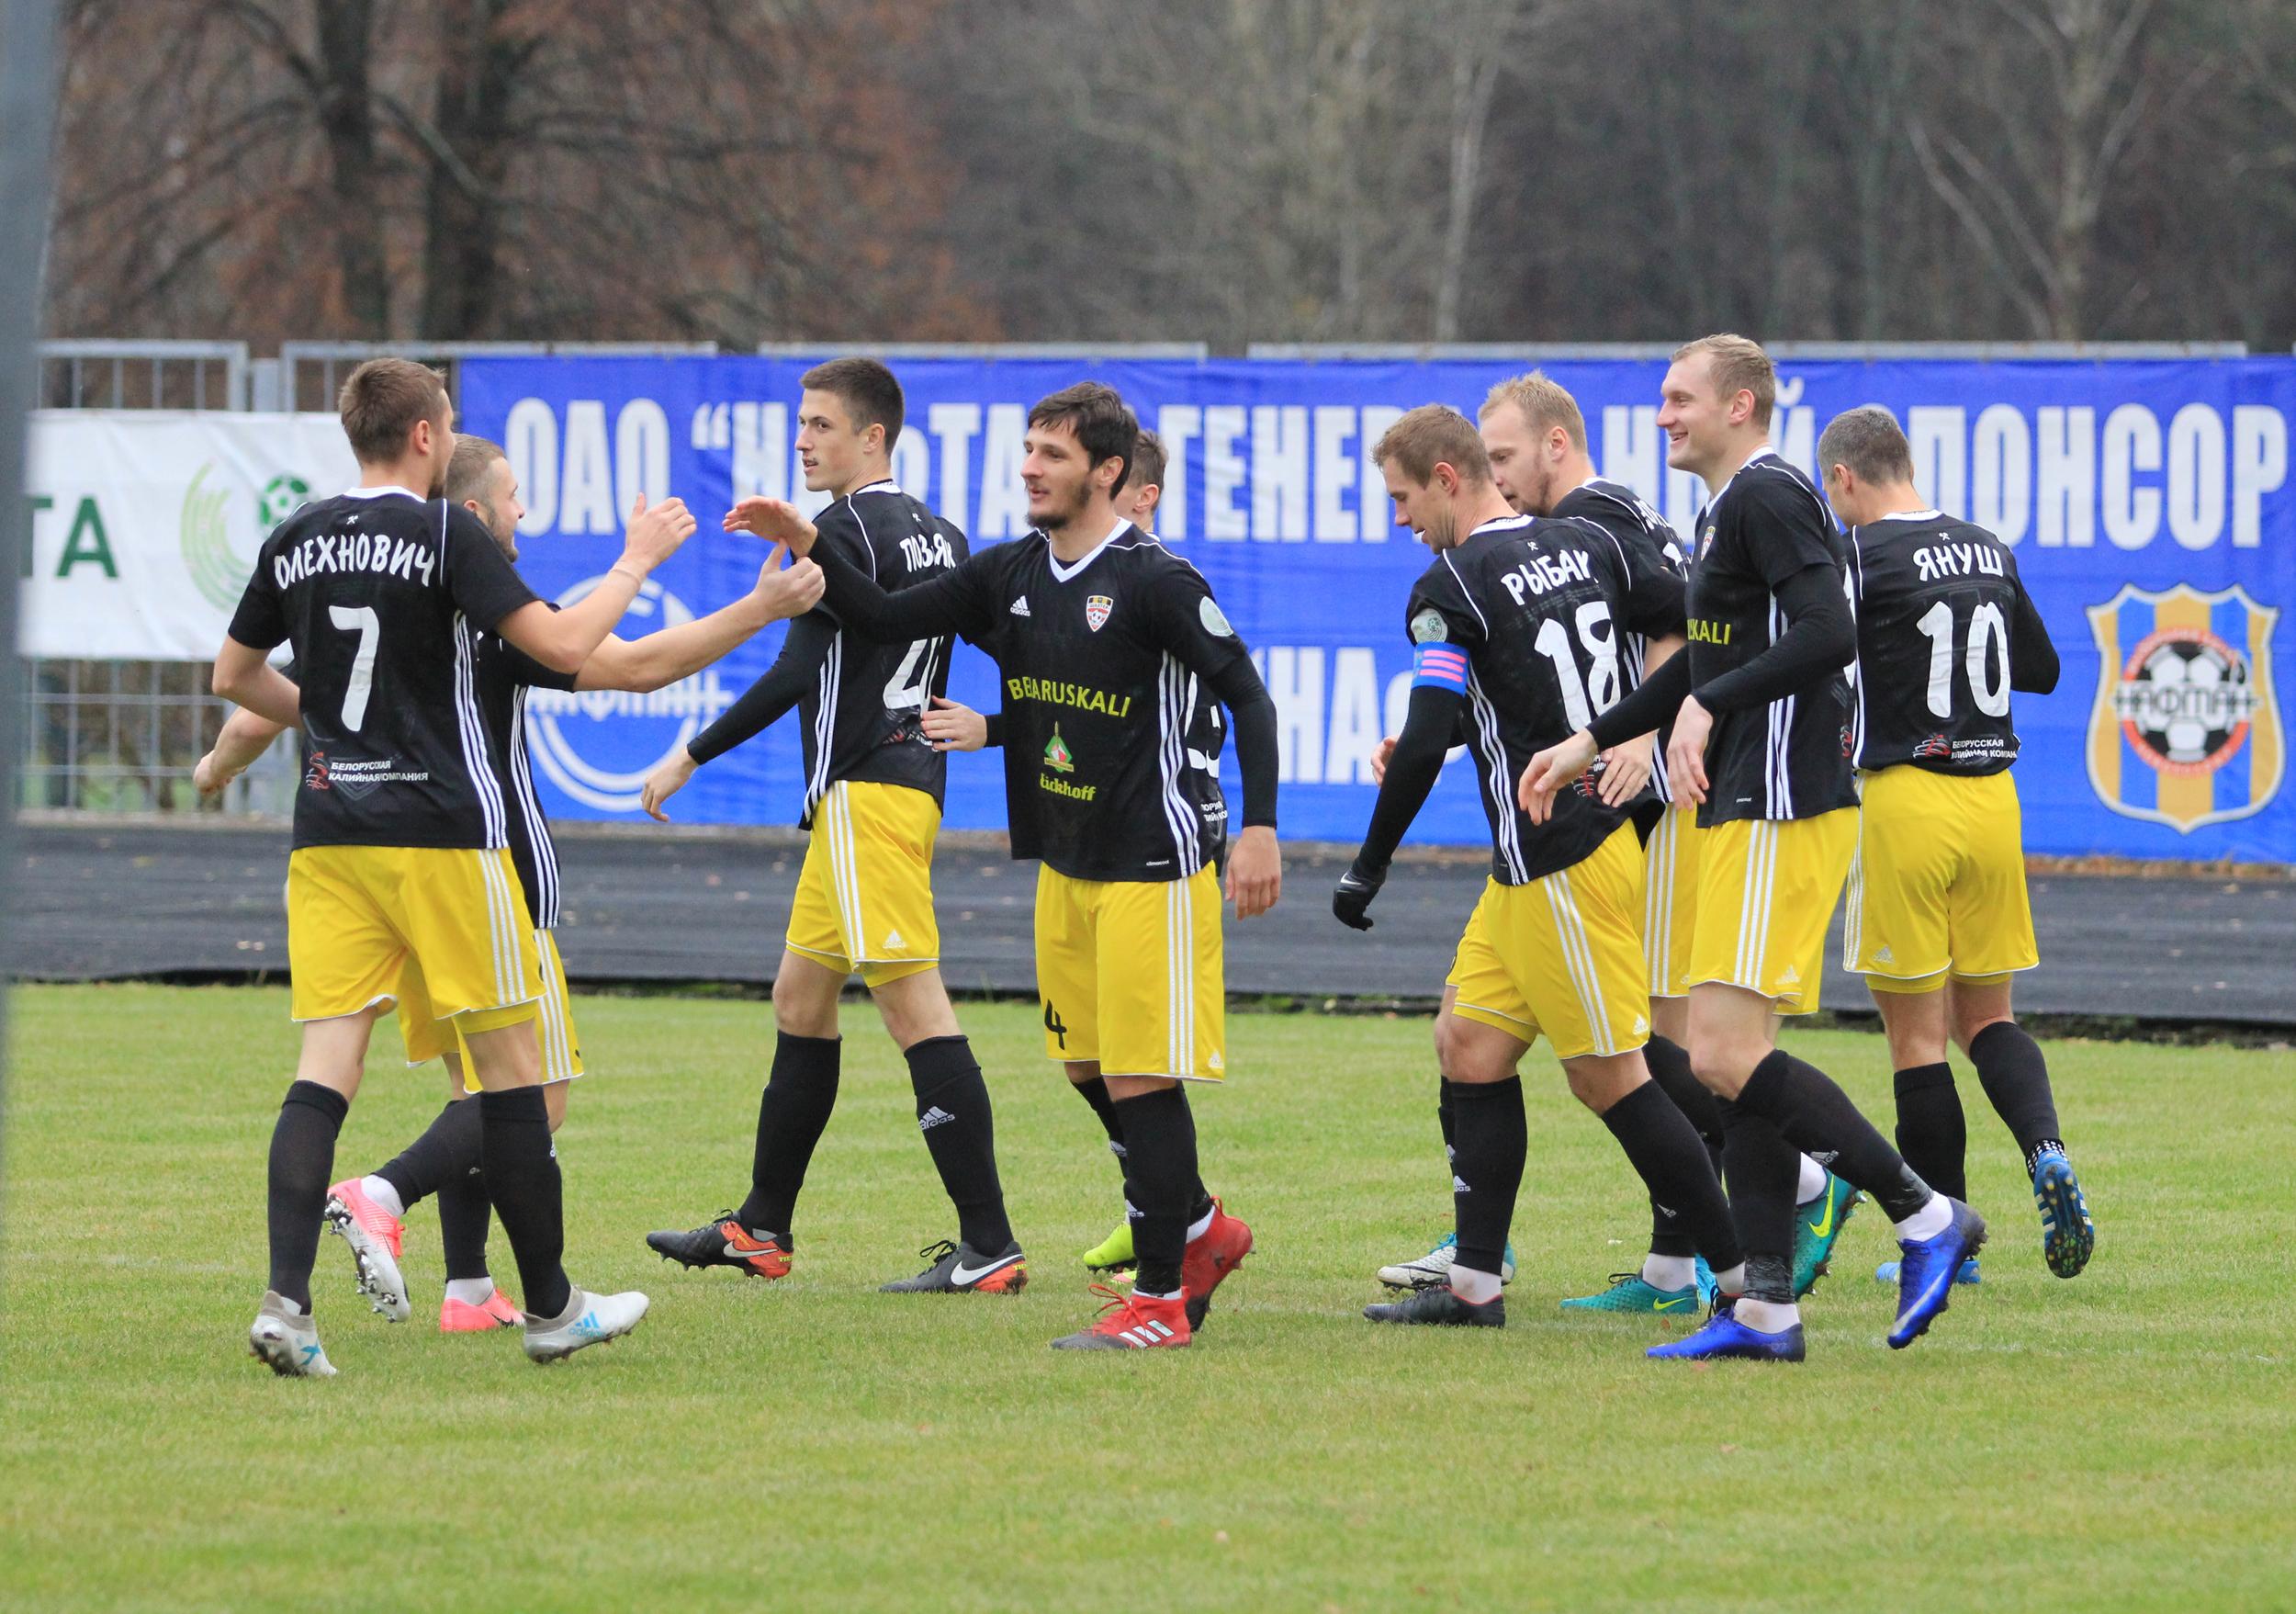 ФК Шахтер Солигорск   Match   Нафтан Новополоцк - Шахтер Солигорск 1:5